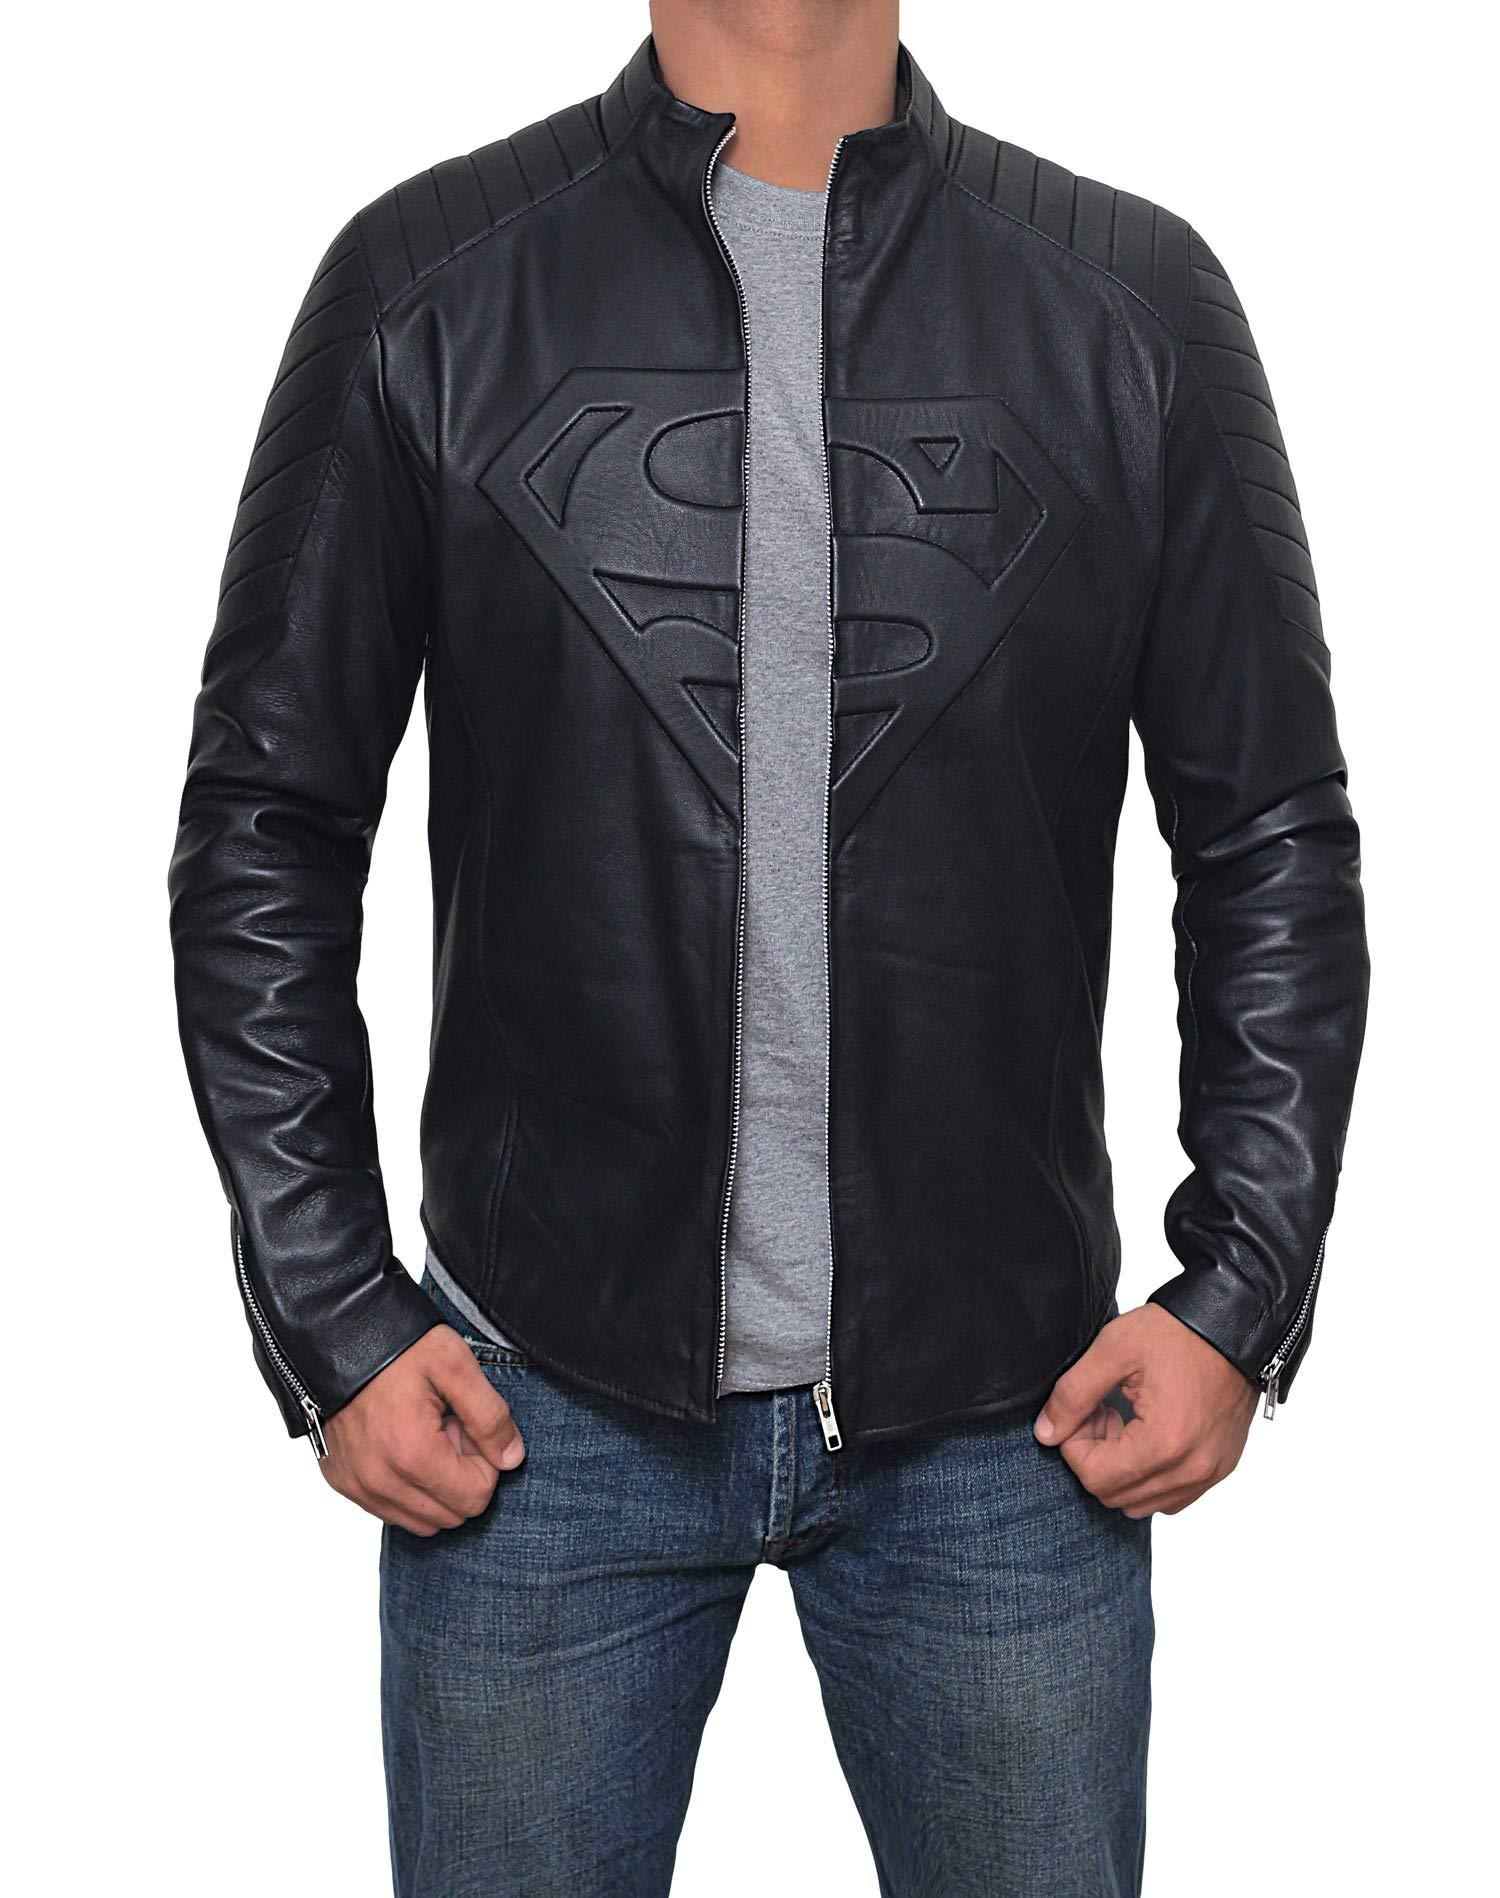 Mens Superman Small Ville Black Leather Jacket |S